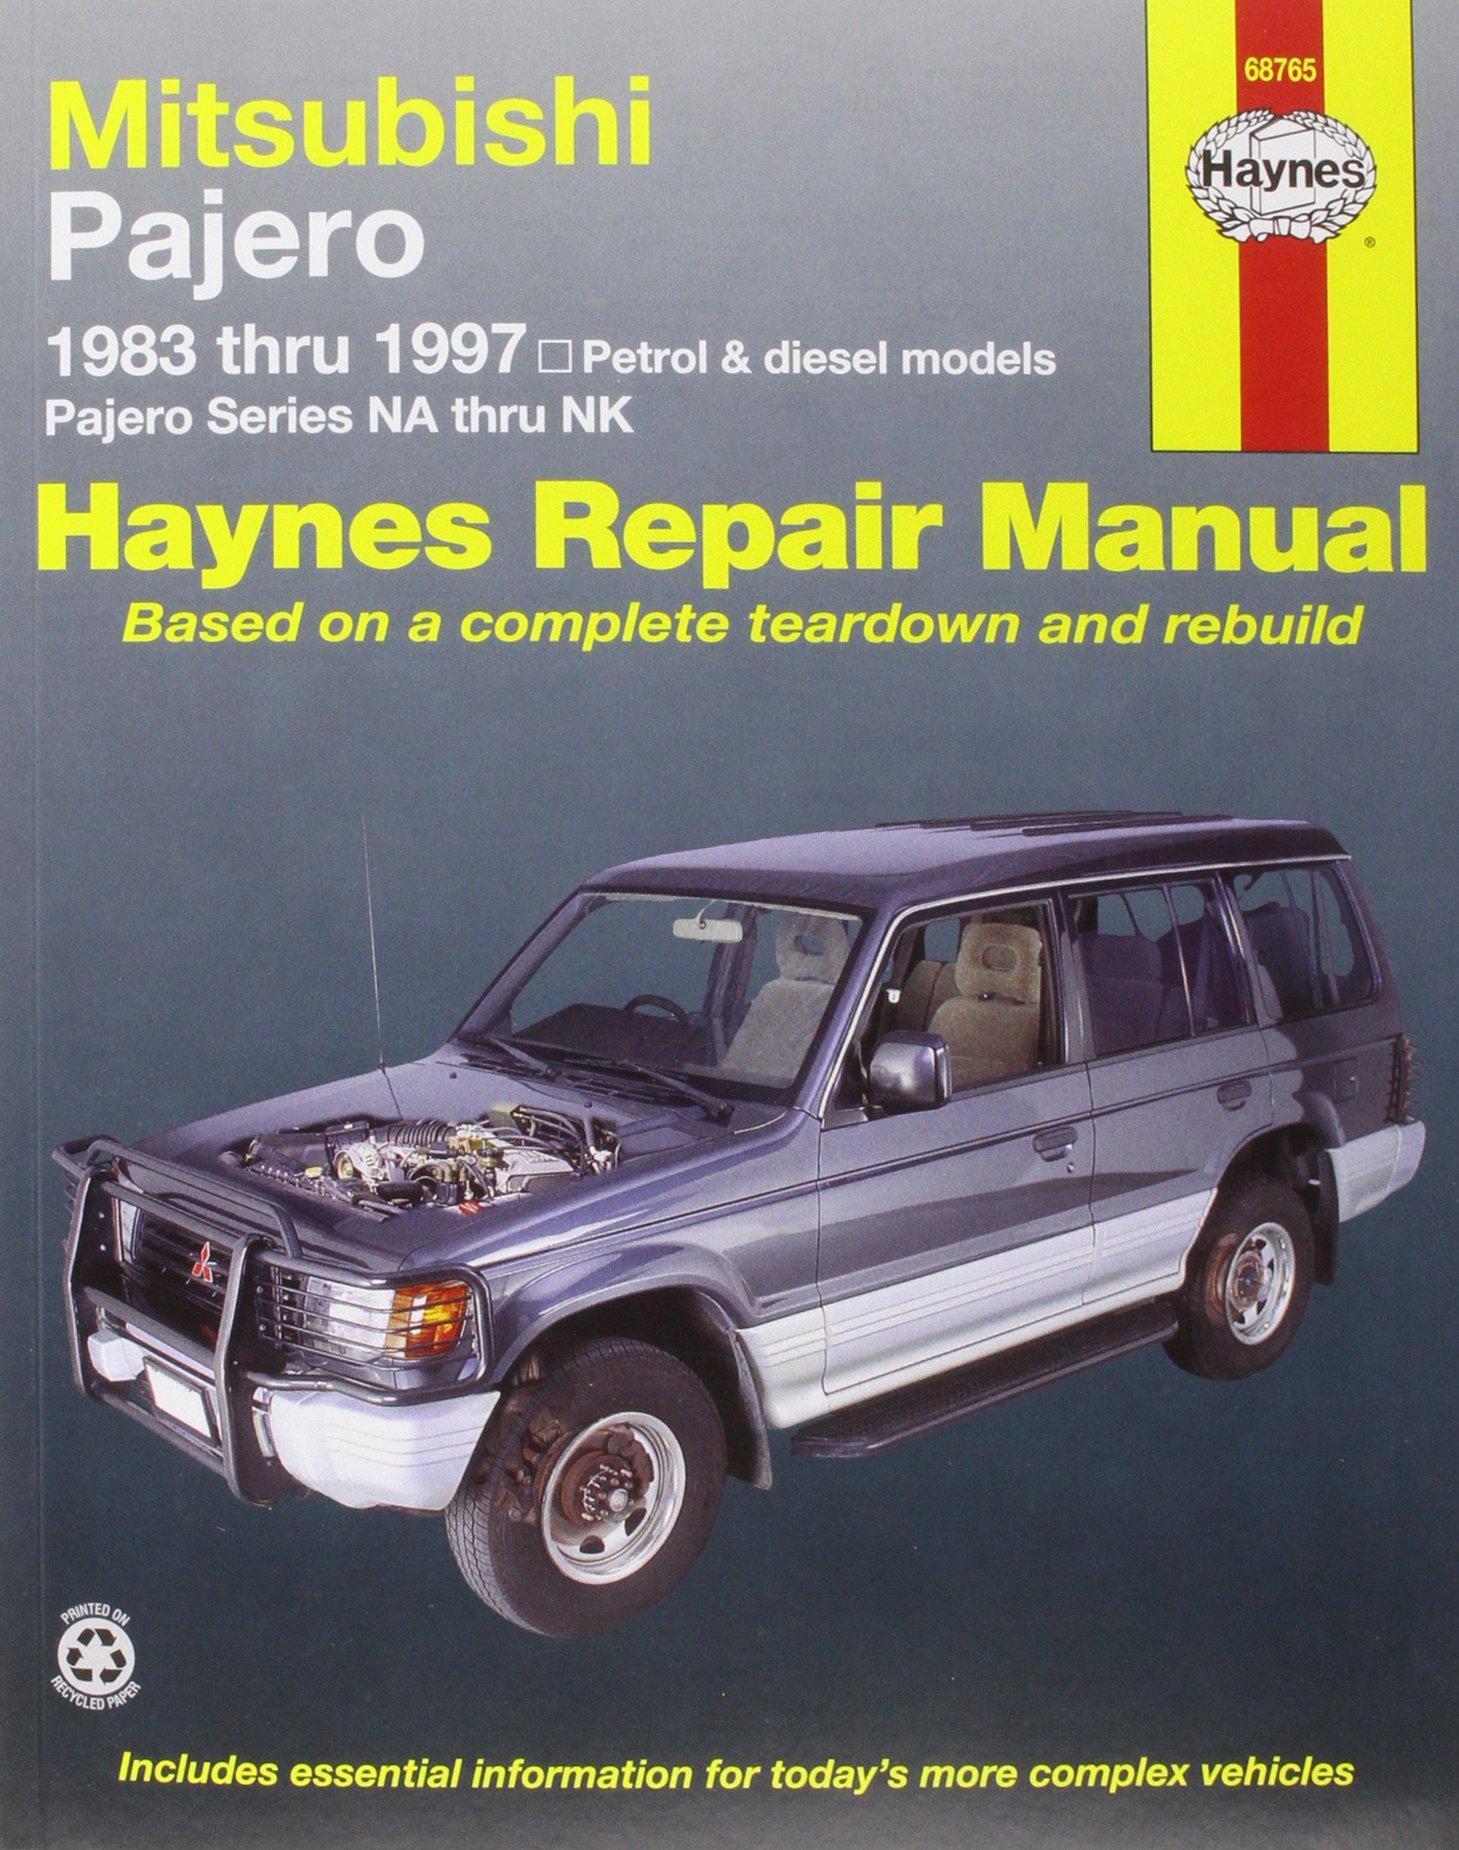 ... Array - buy mitsubishi pajero petrol u0026 diesel 83 97 book online at  low rh amazon